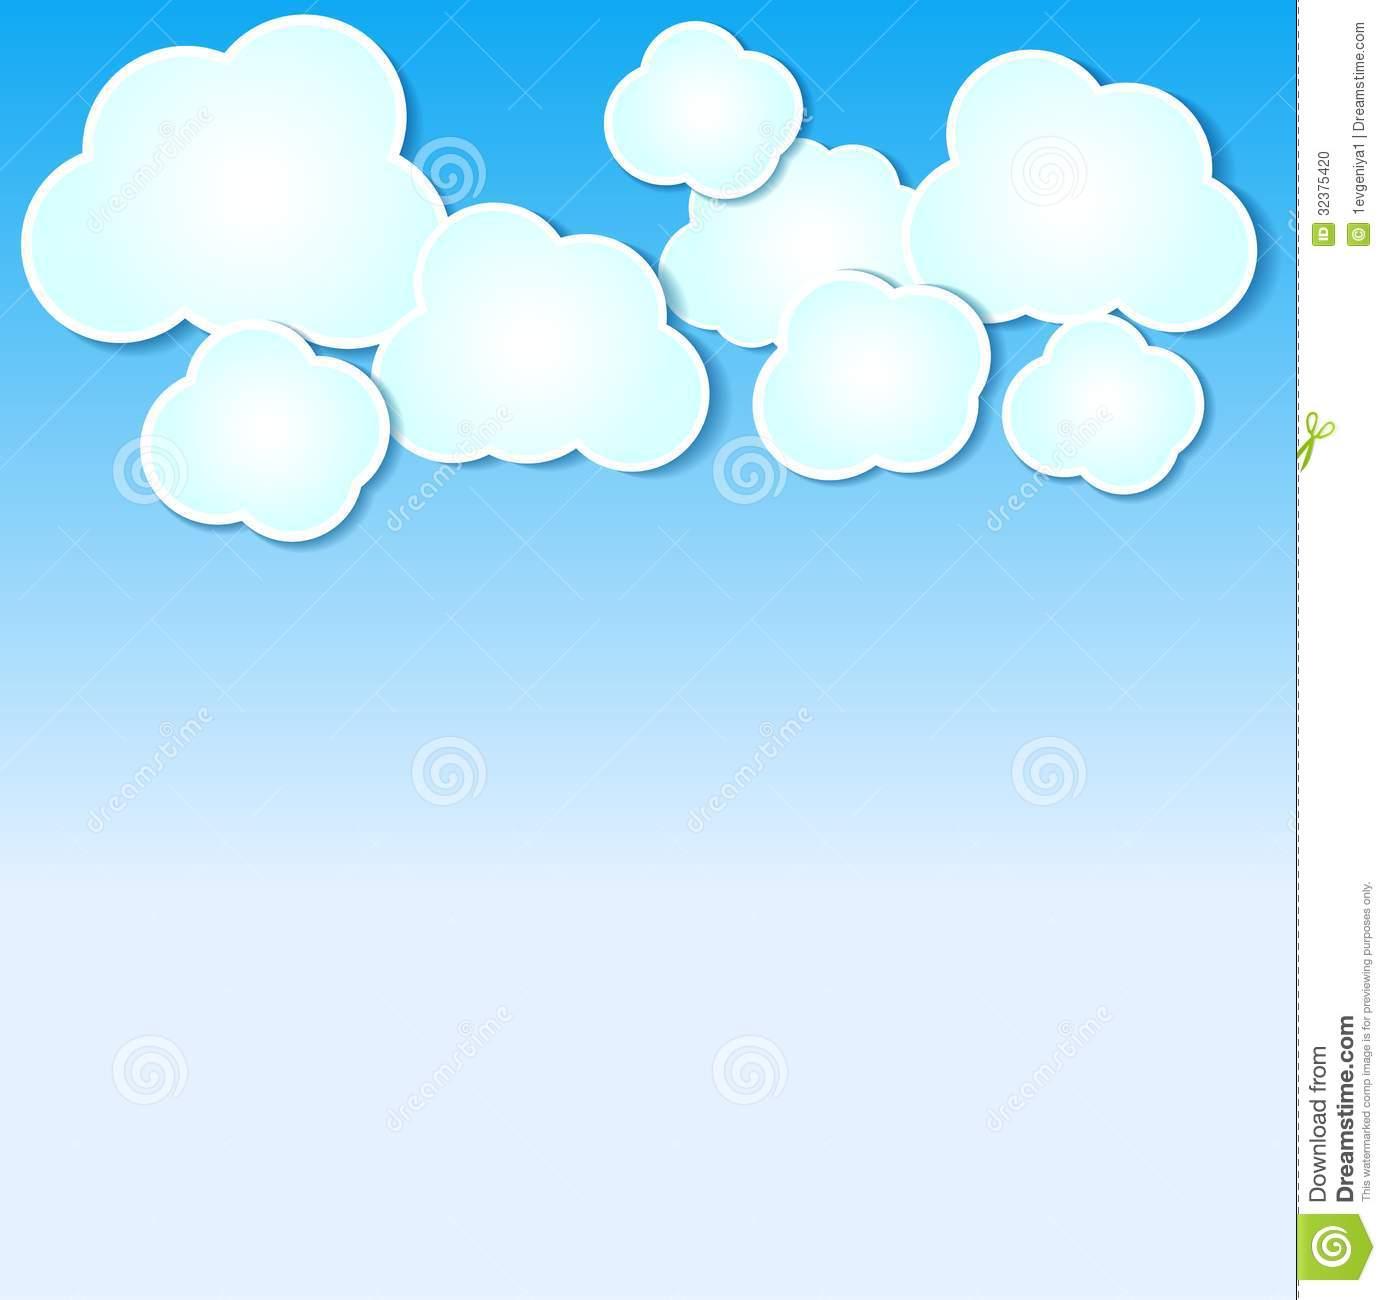 cloud clipart background - photo #49